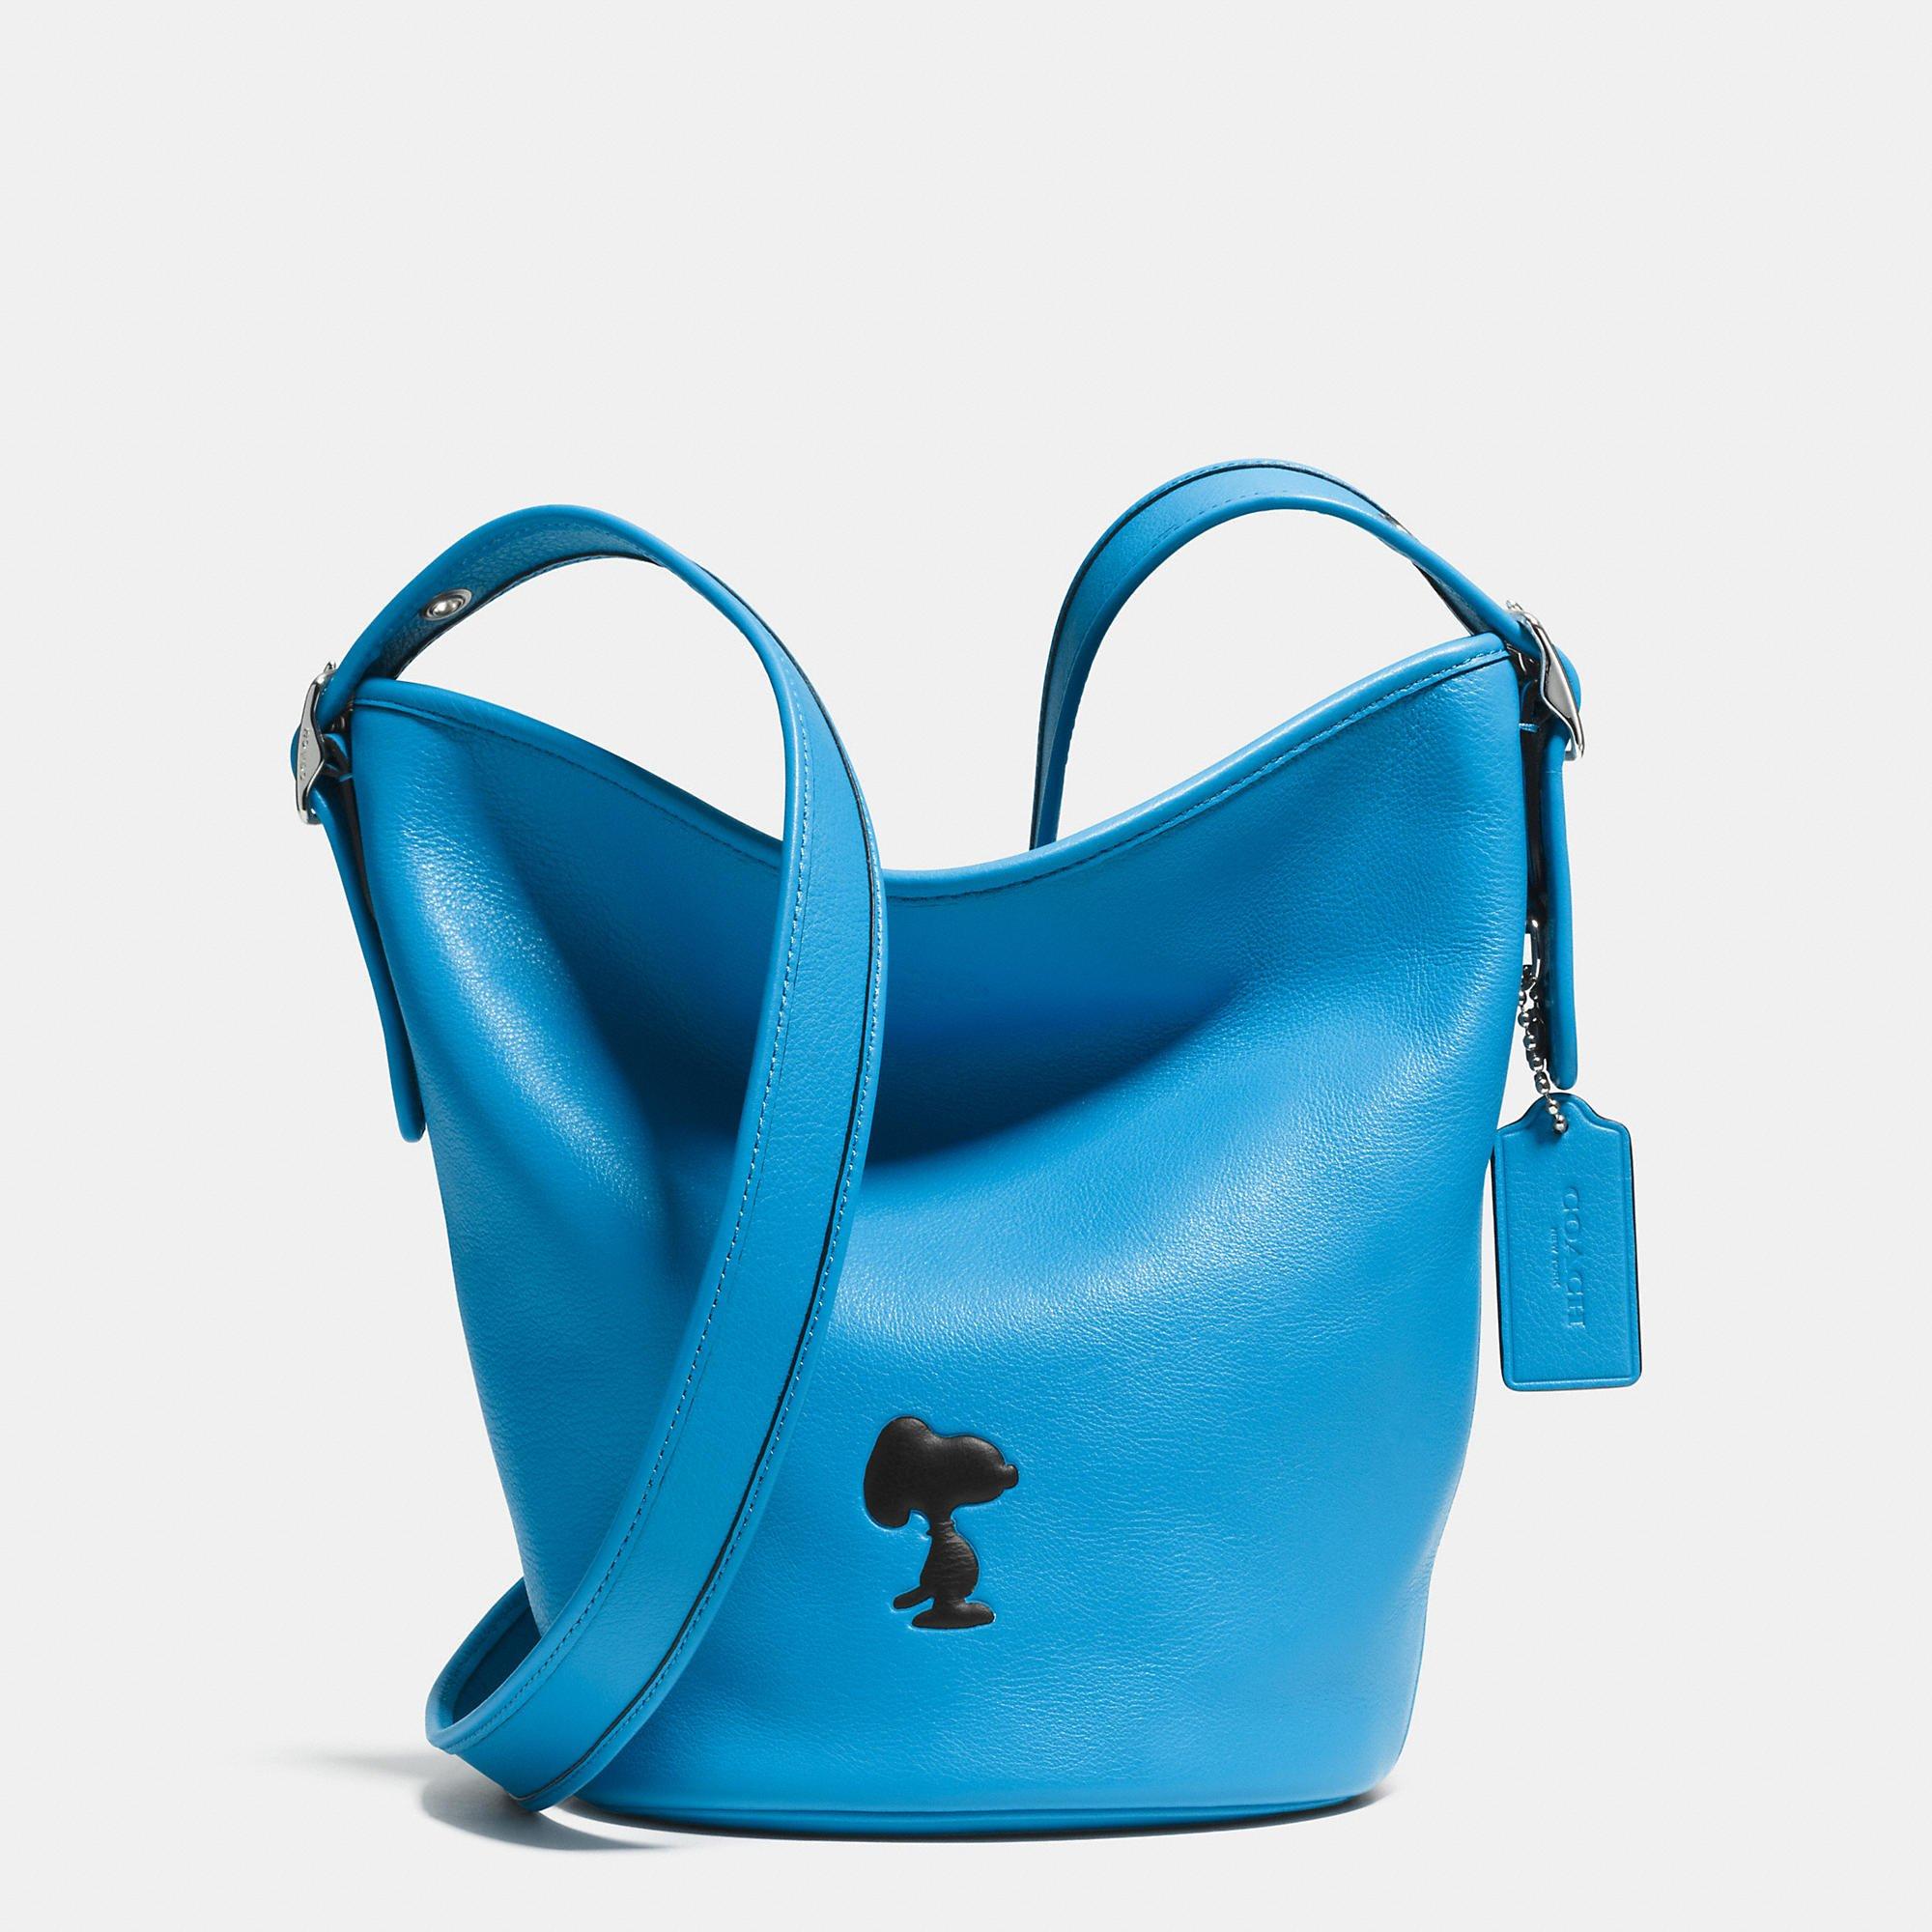 Coach X Peanuts Bleecker Mini Duffle In Leather in Blue